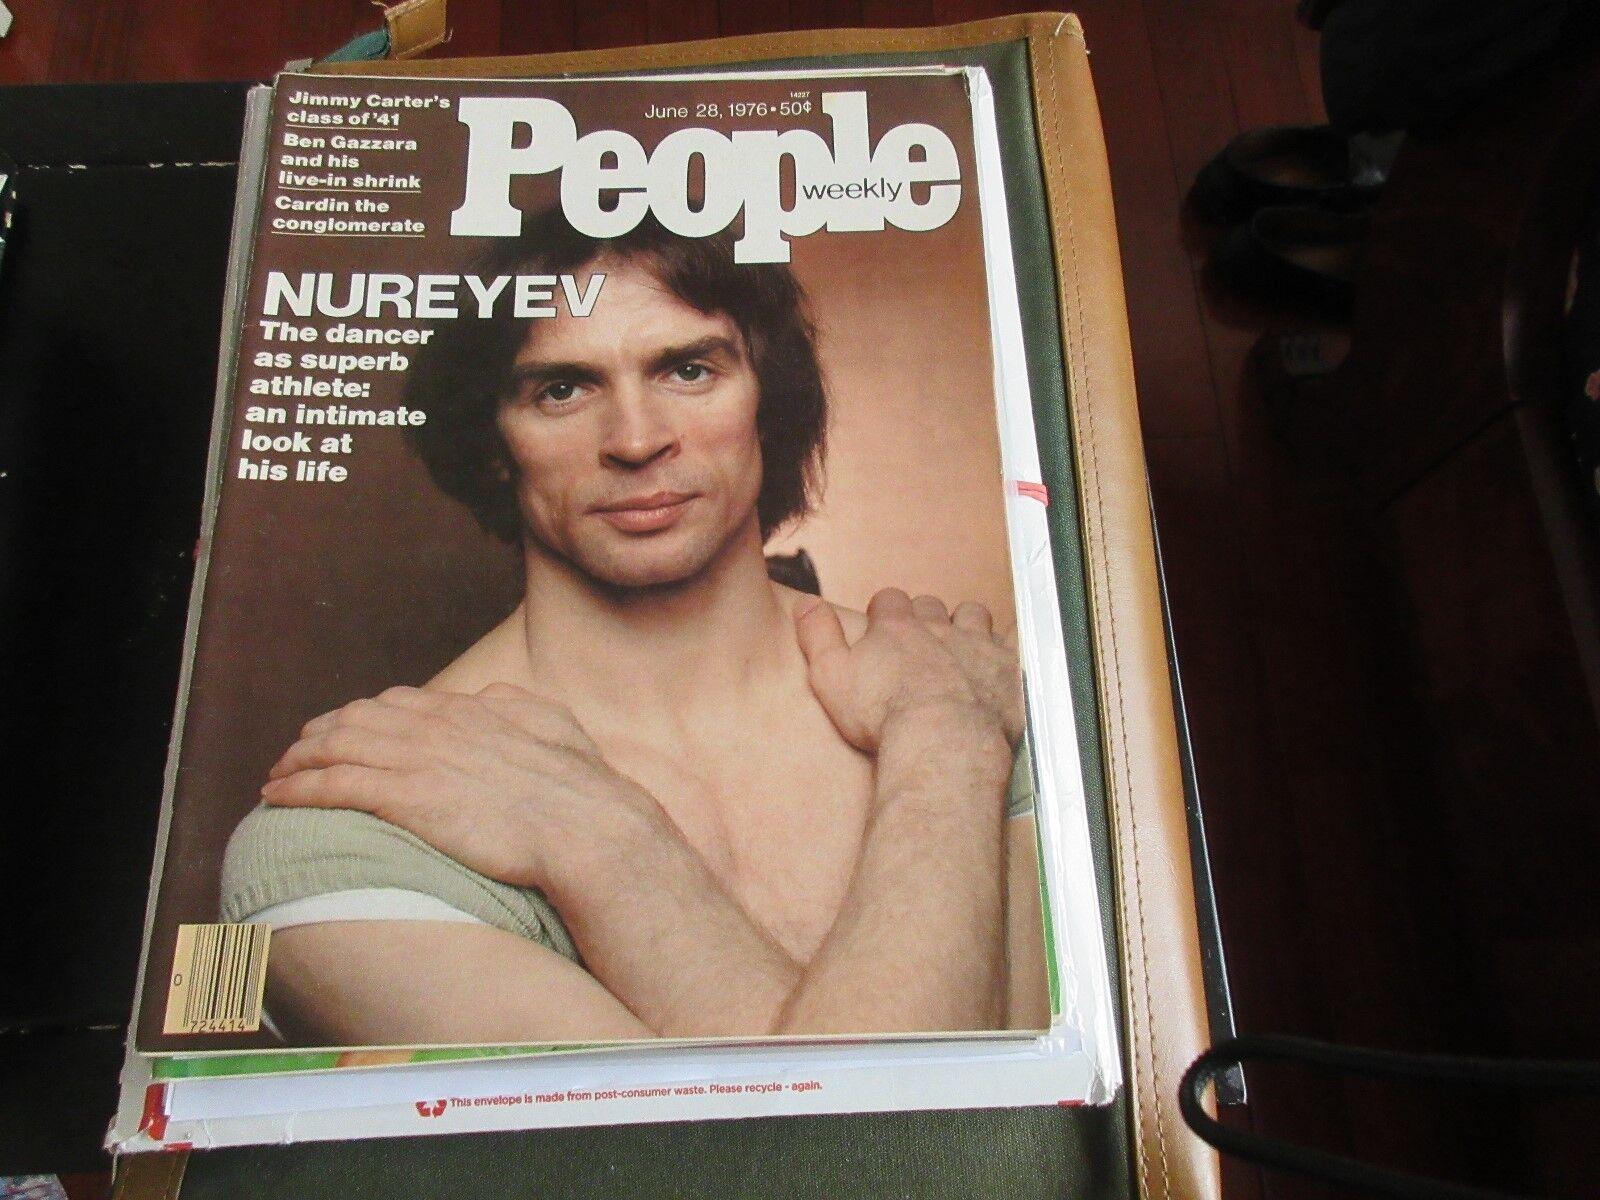 NUREYEV , PEOPLE MAGAZINE , 6/28/76, Jimmy Carter , Ben